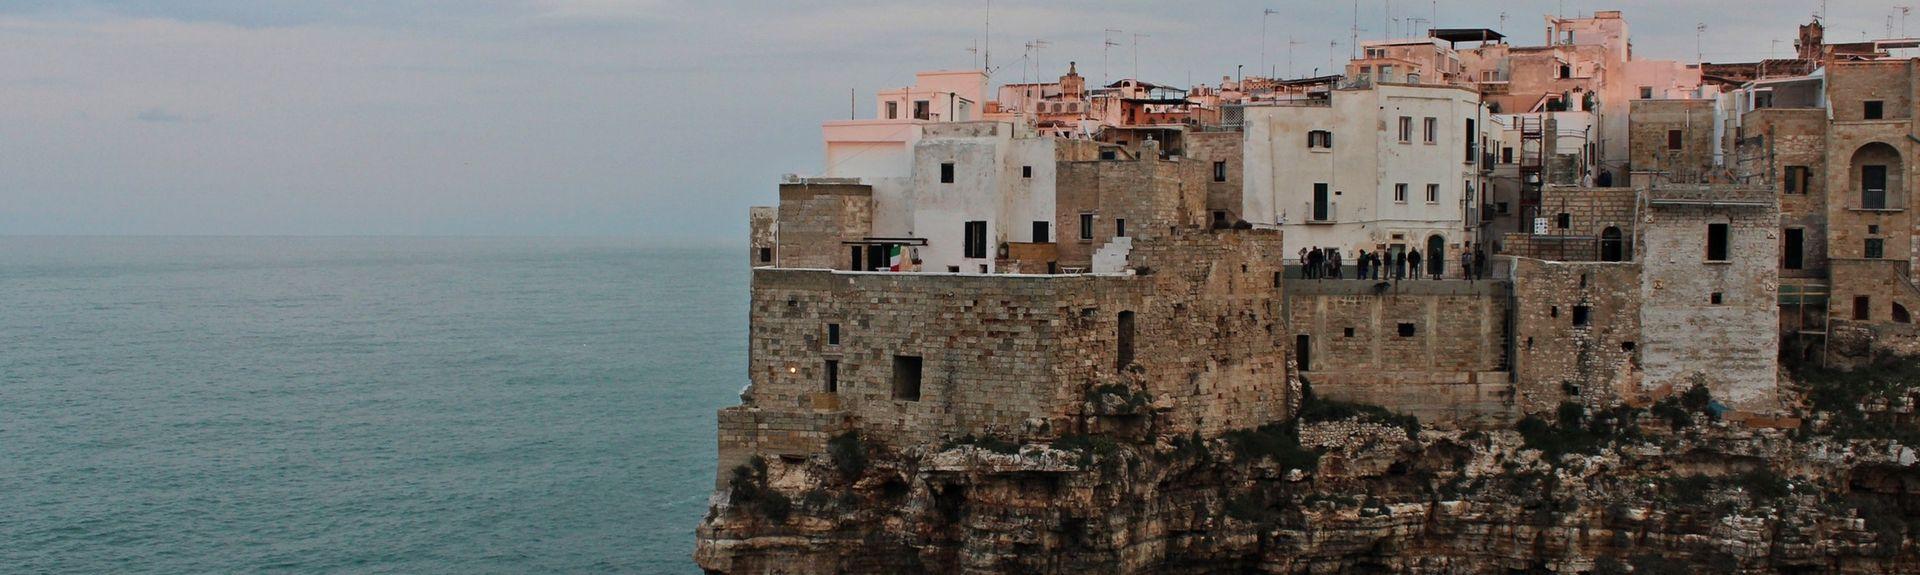 Terlizzi, Metropolitan City of Bari, Puglia, Italy